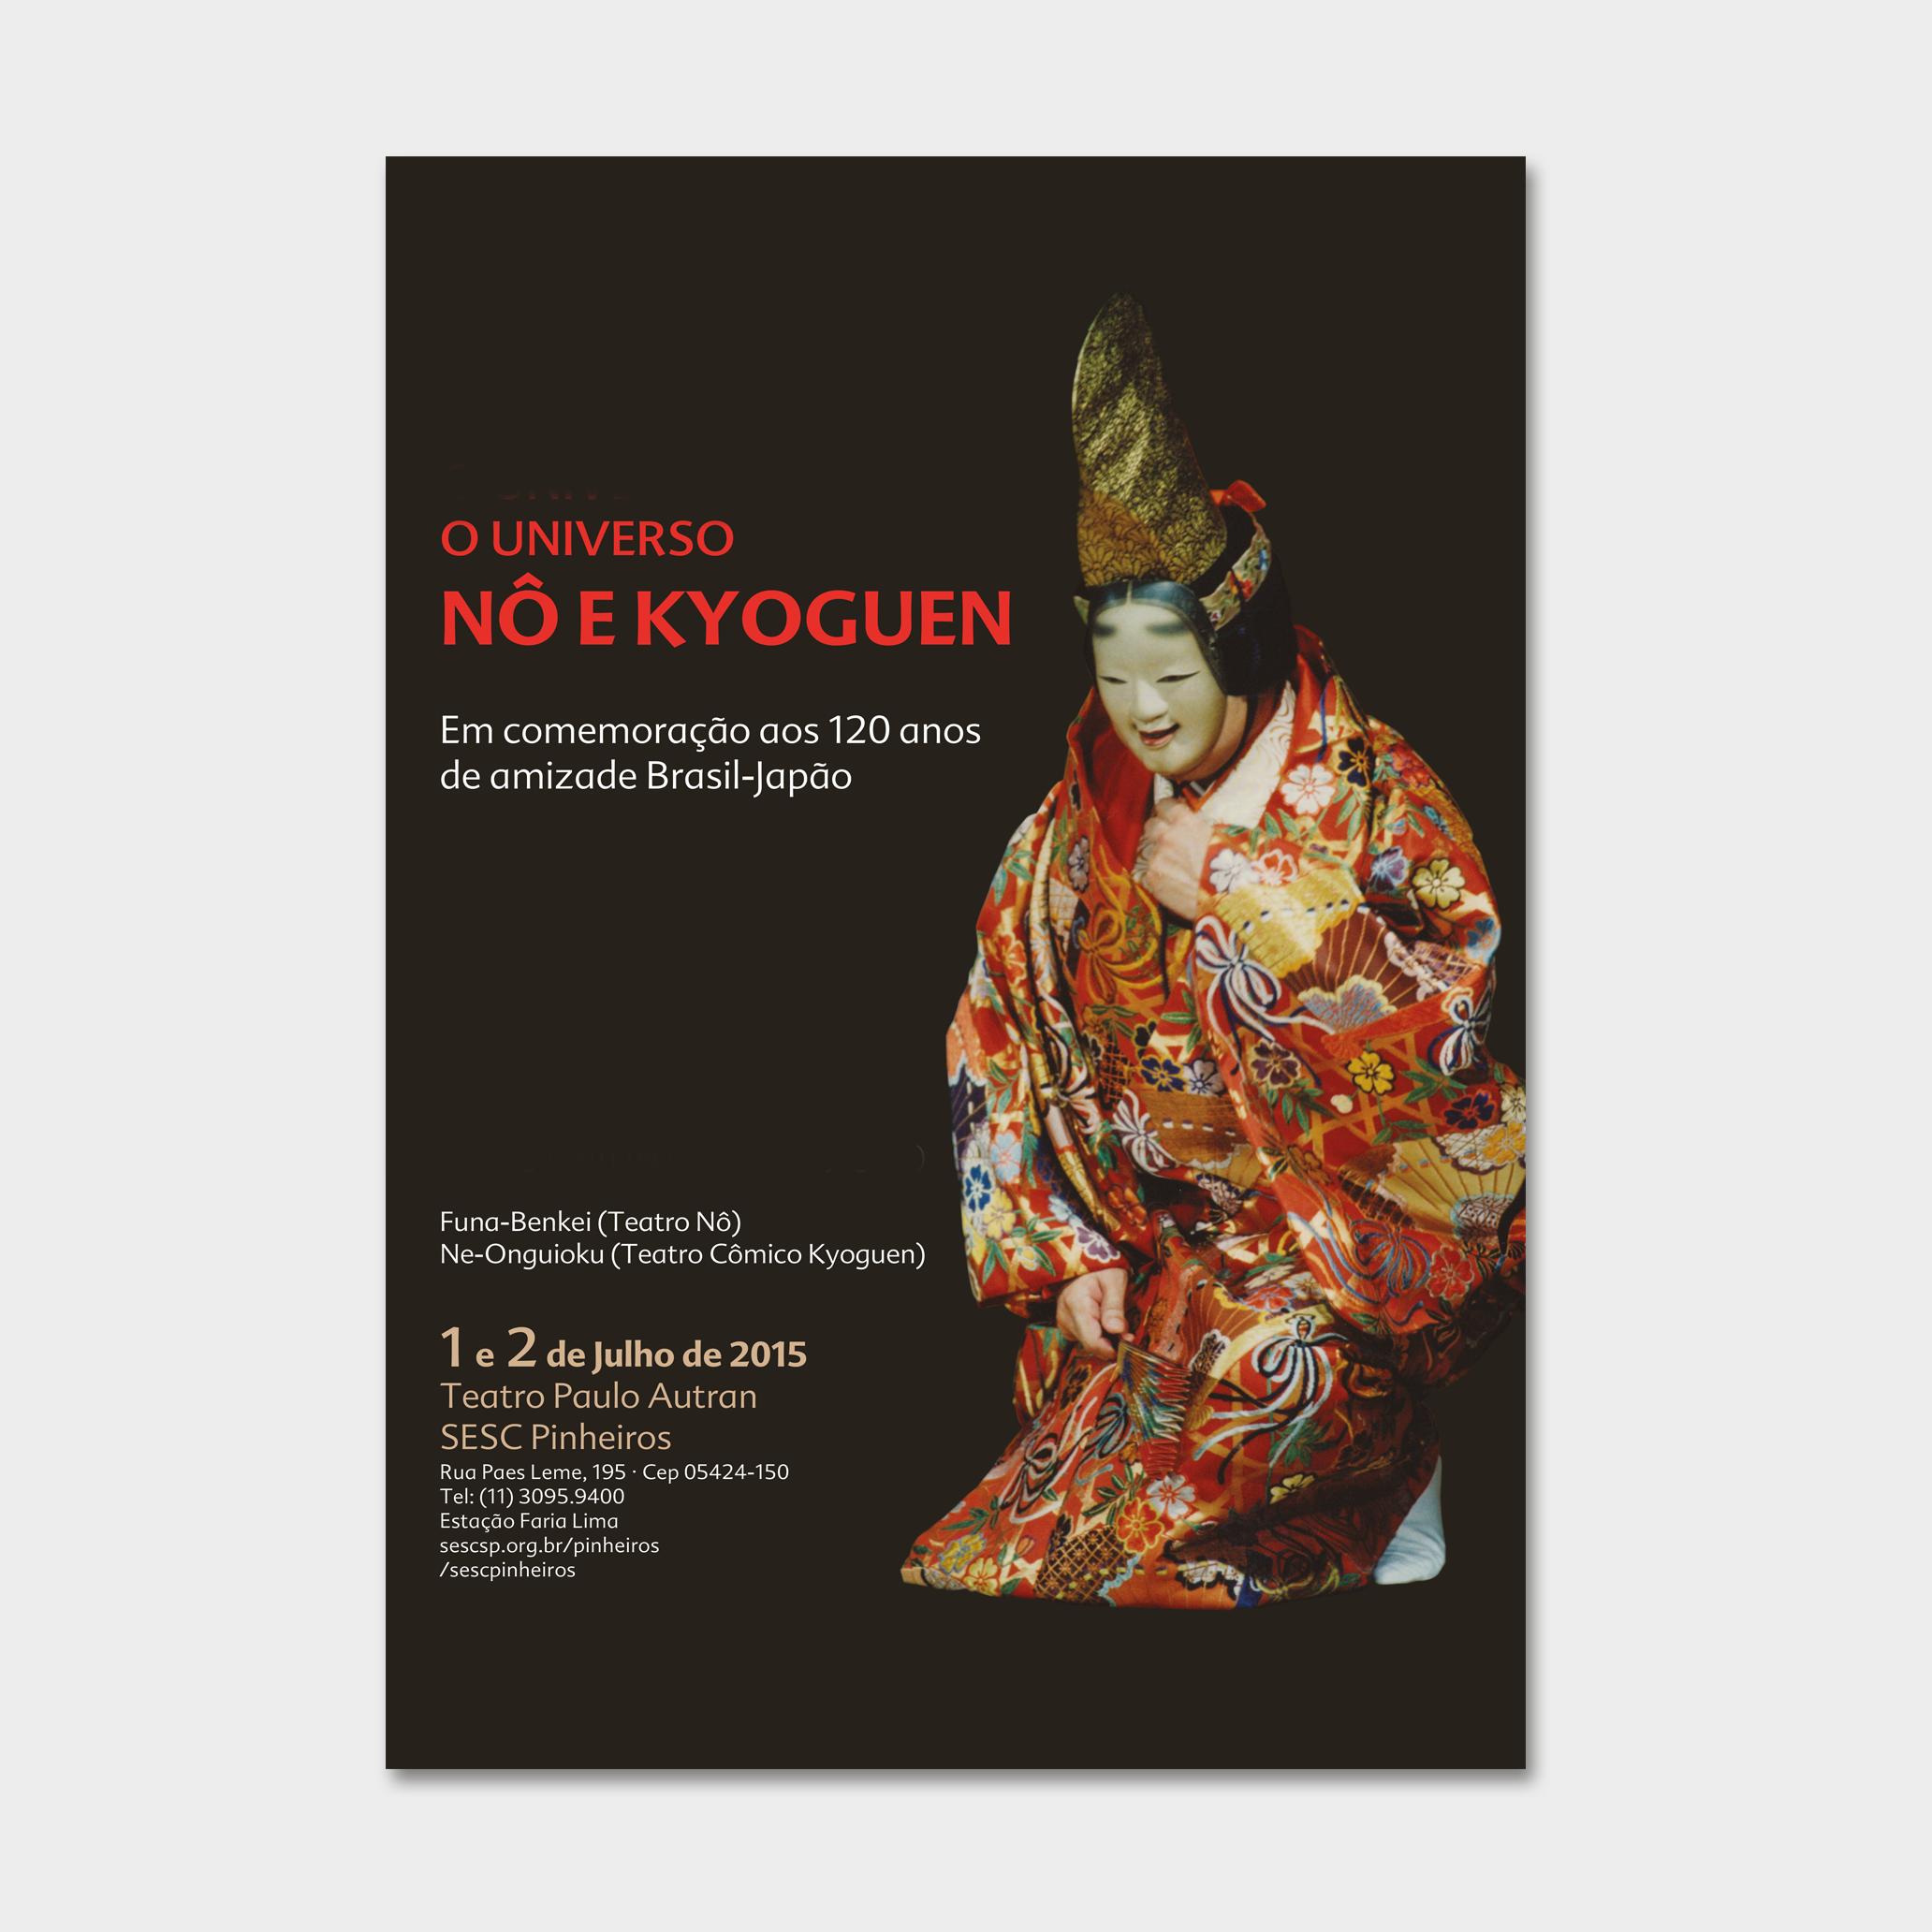 Cartaz A3 do espetáculo : Nô e Kyôguen.